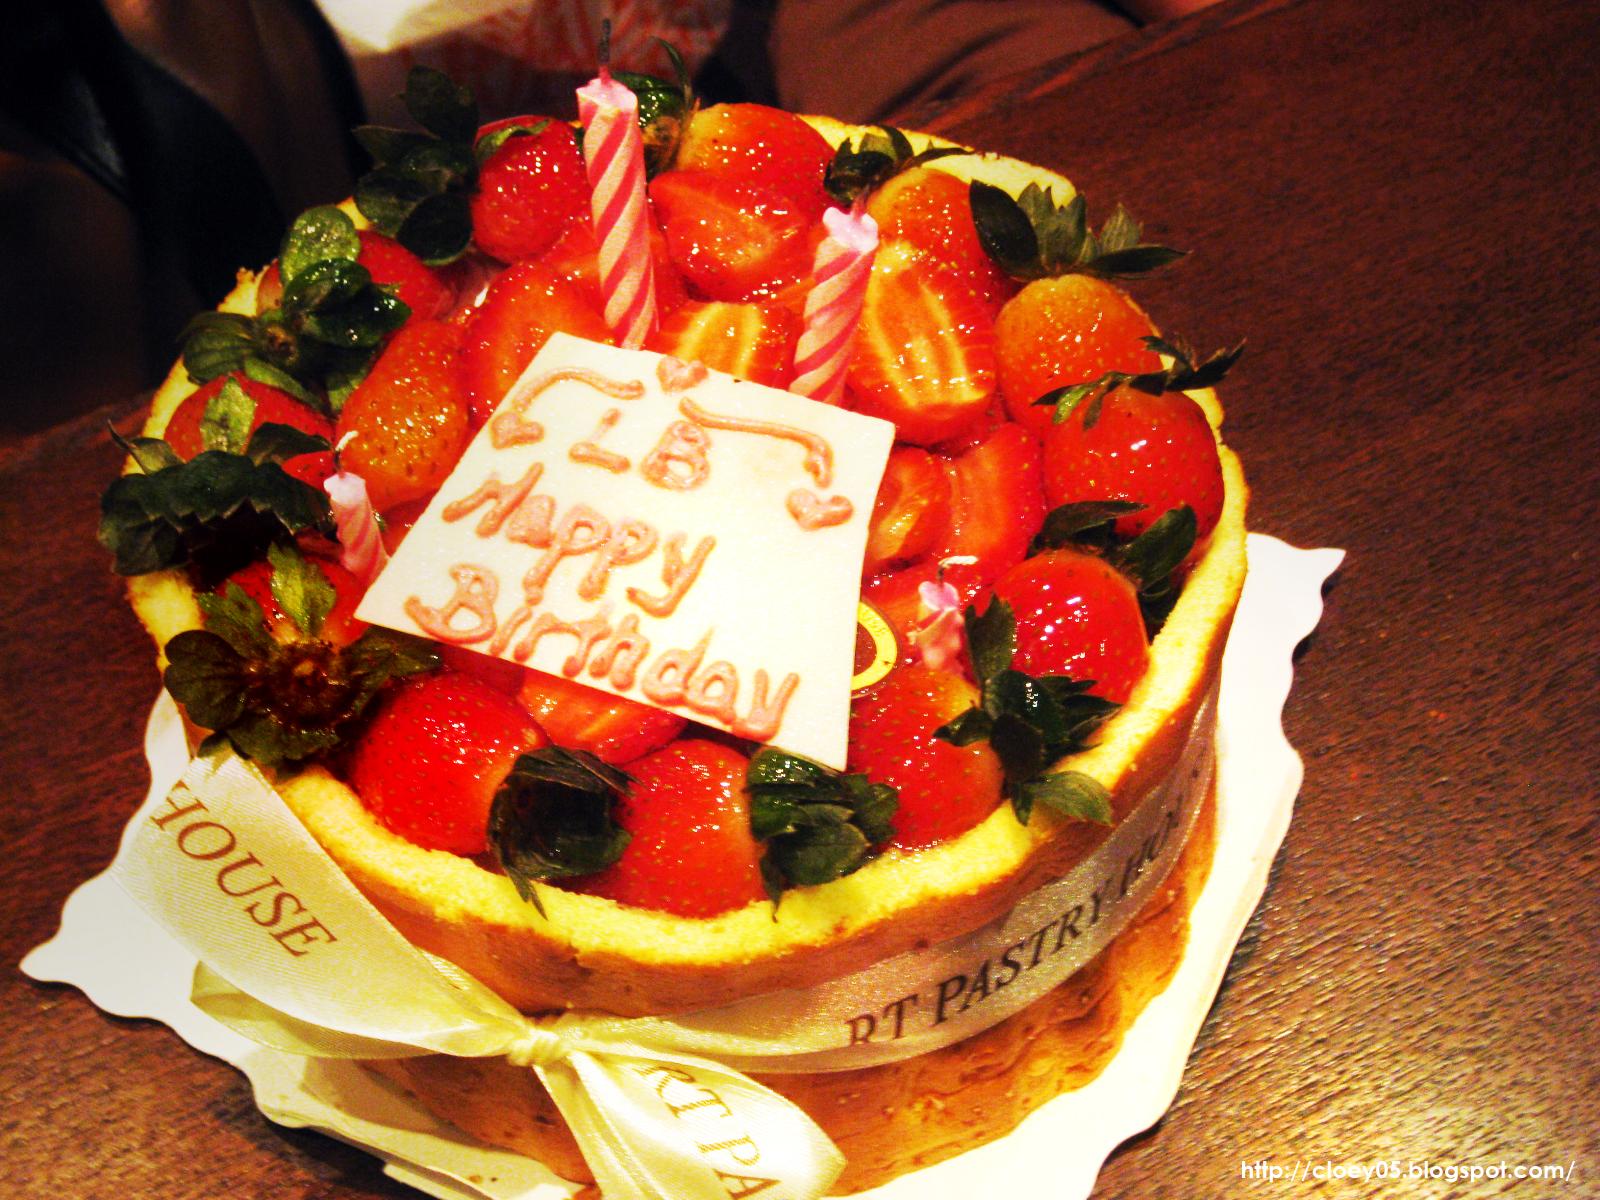 Her Birthday Rt Pastry House